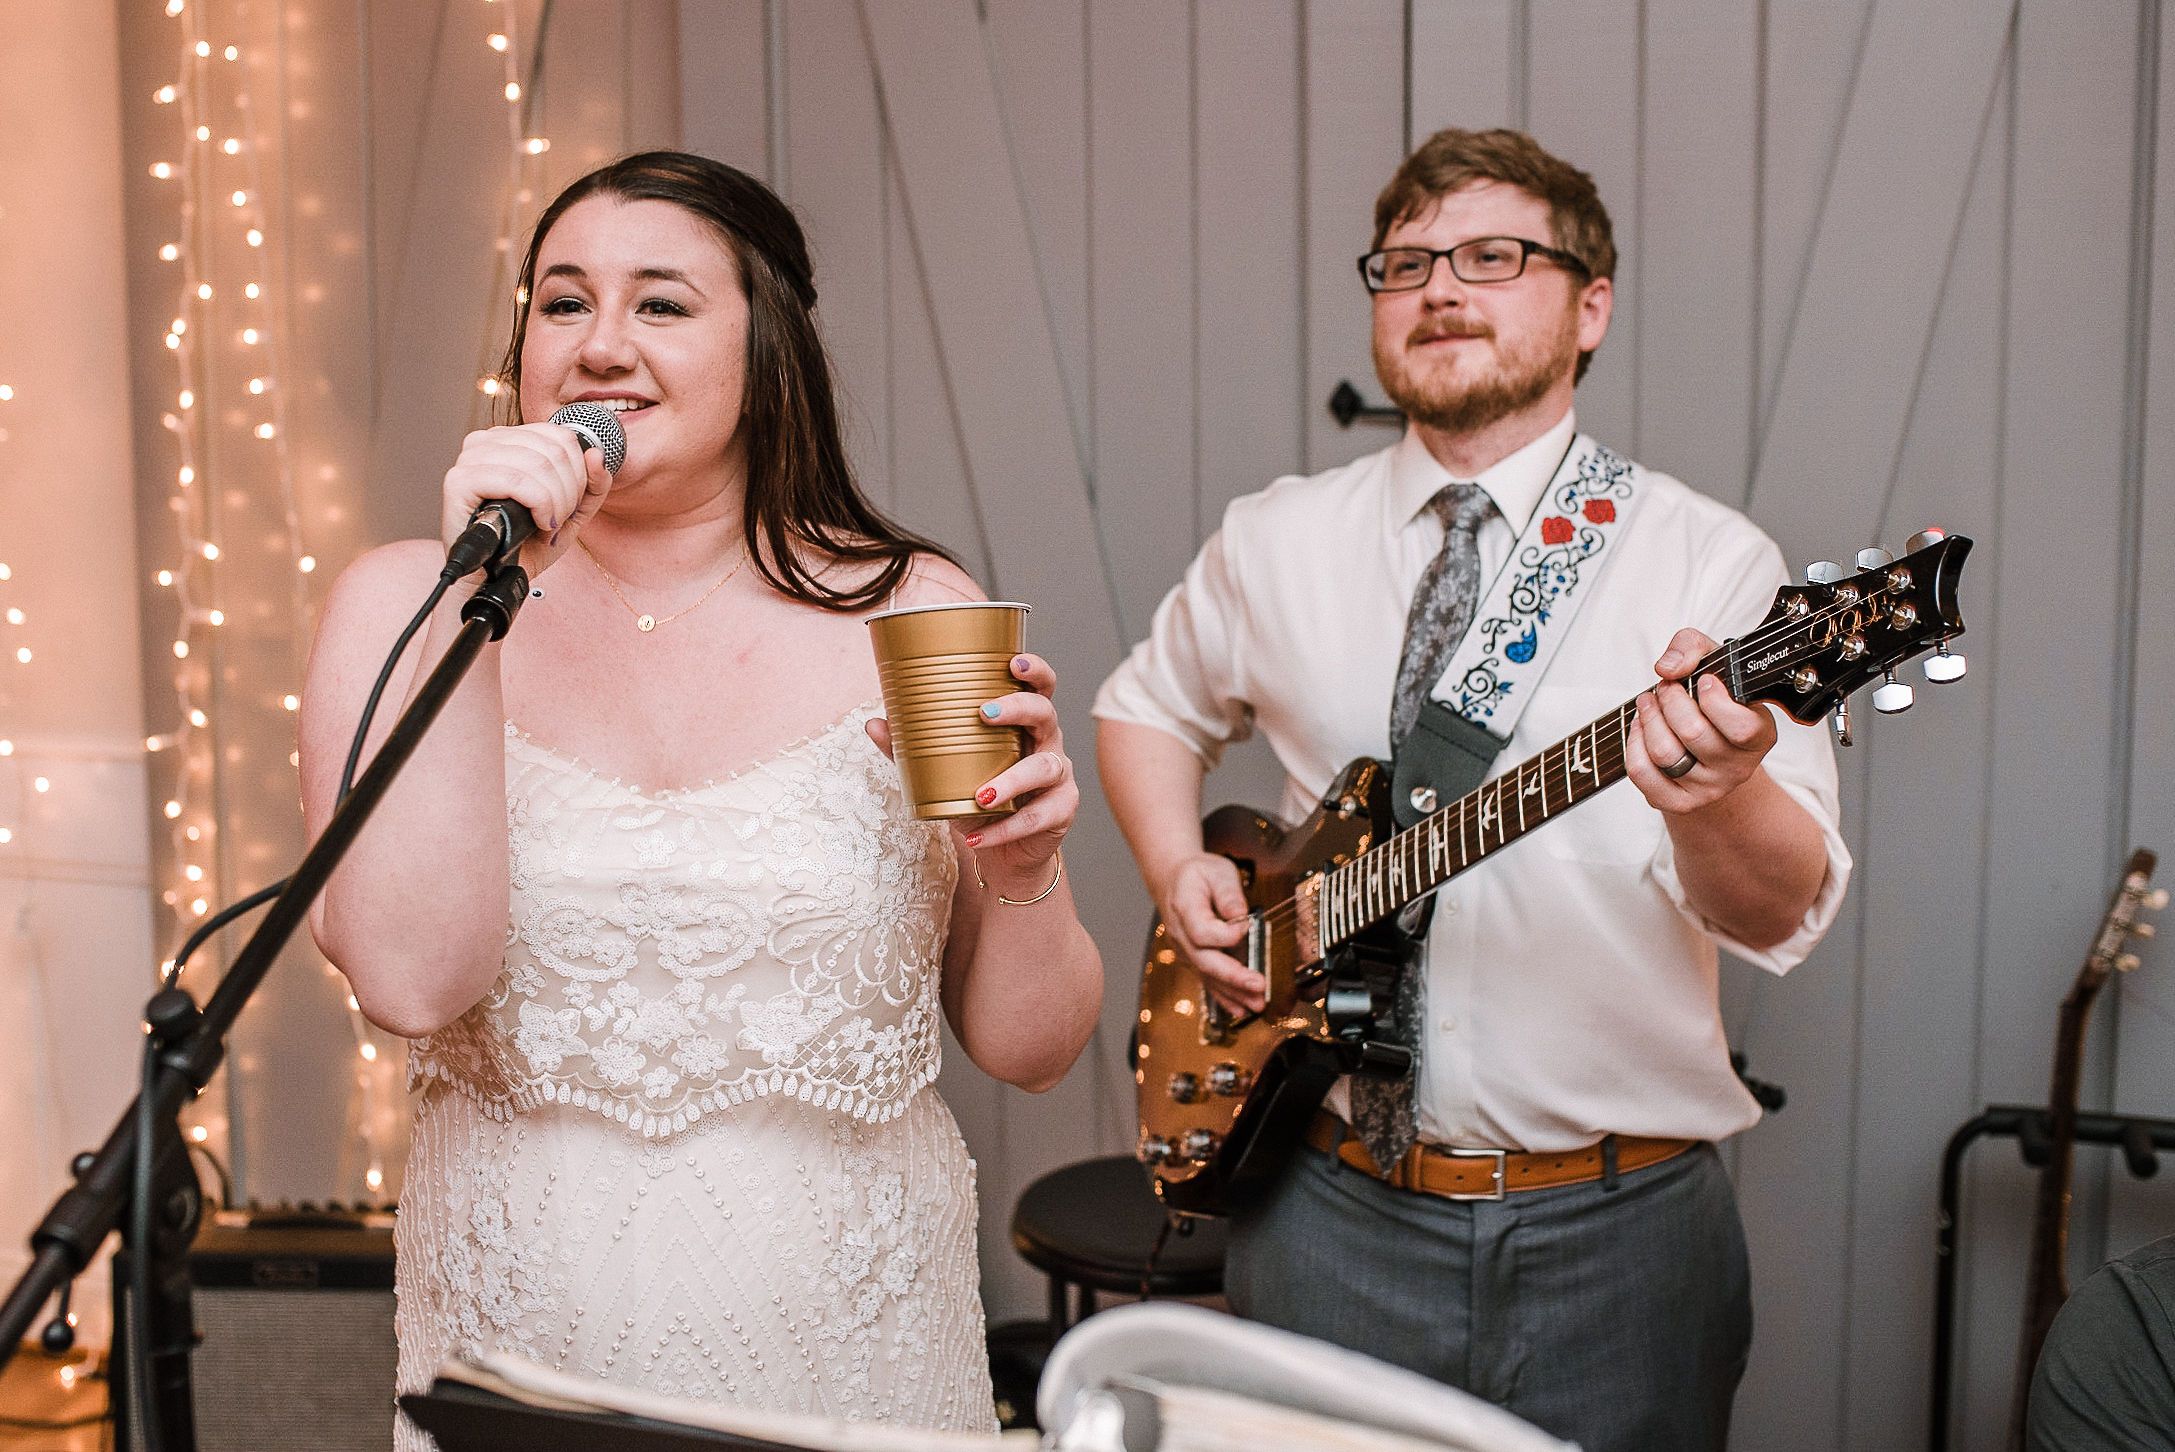 bride sings as groom plays guitar at wedding reception at MAVFC Reception Hall